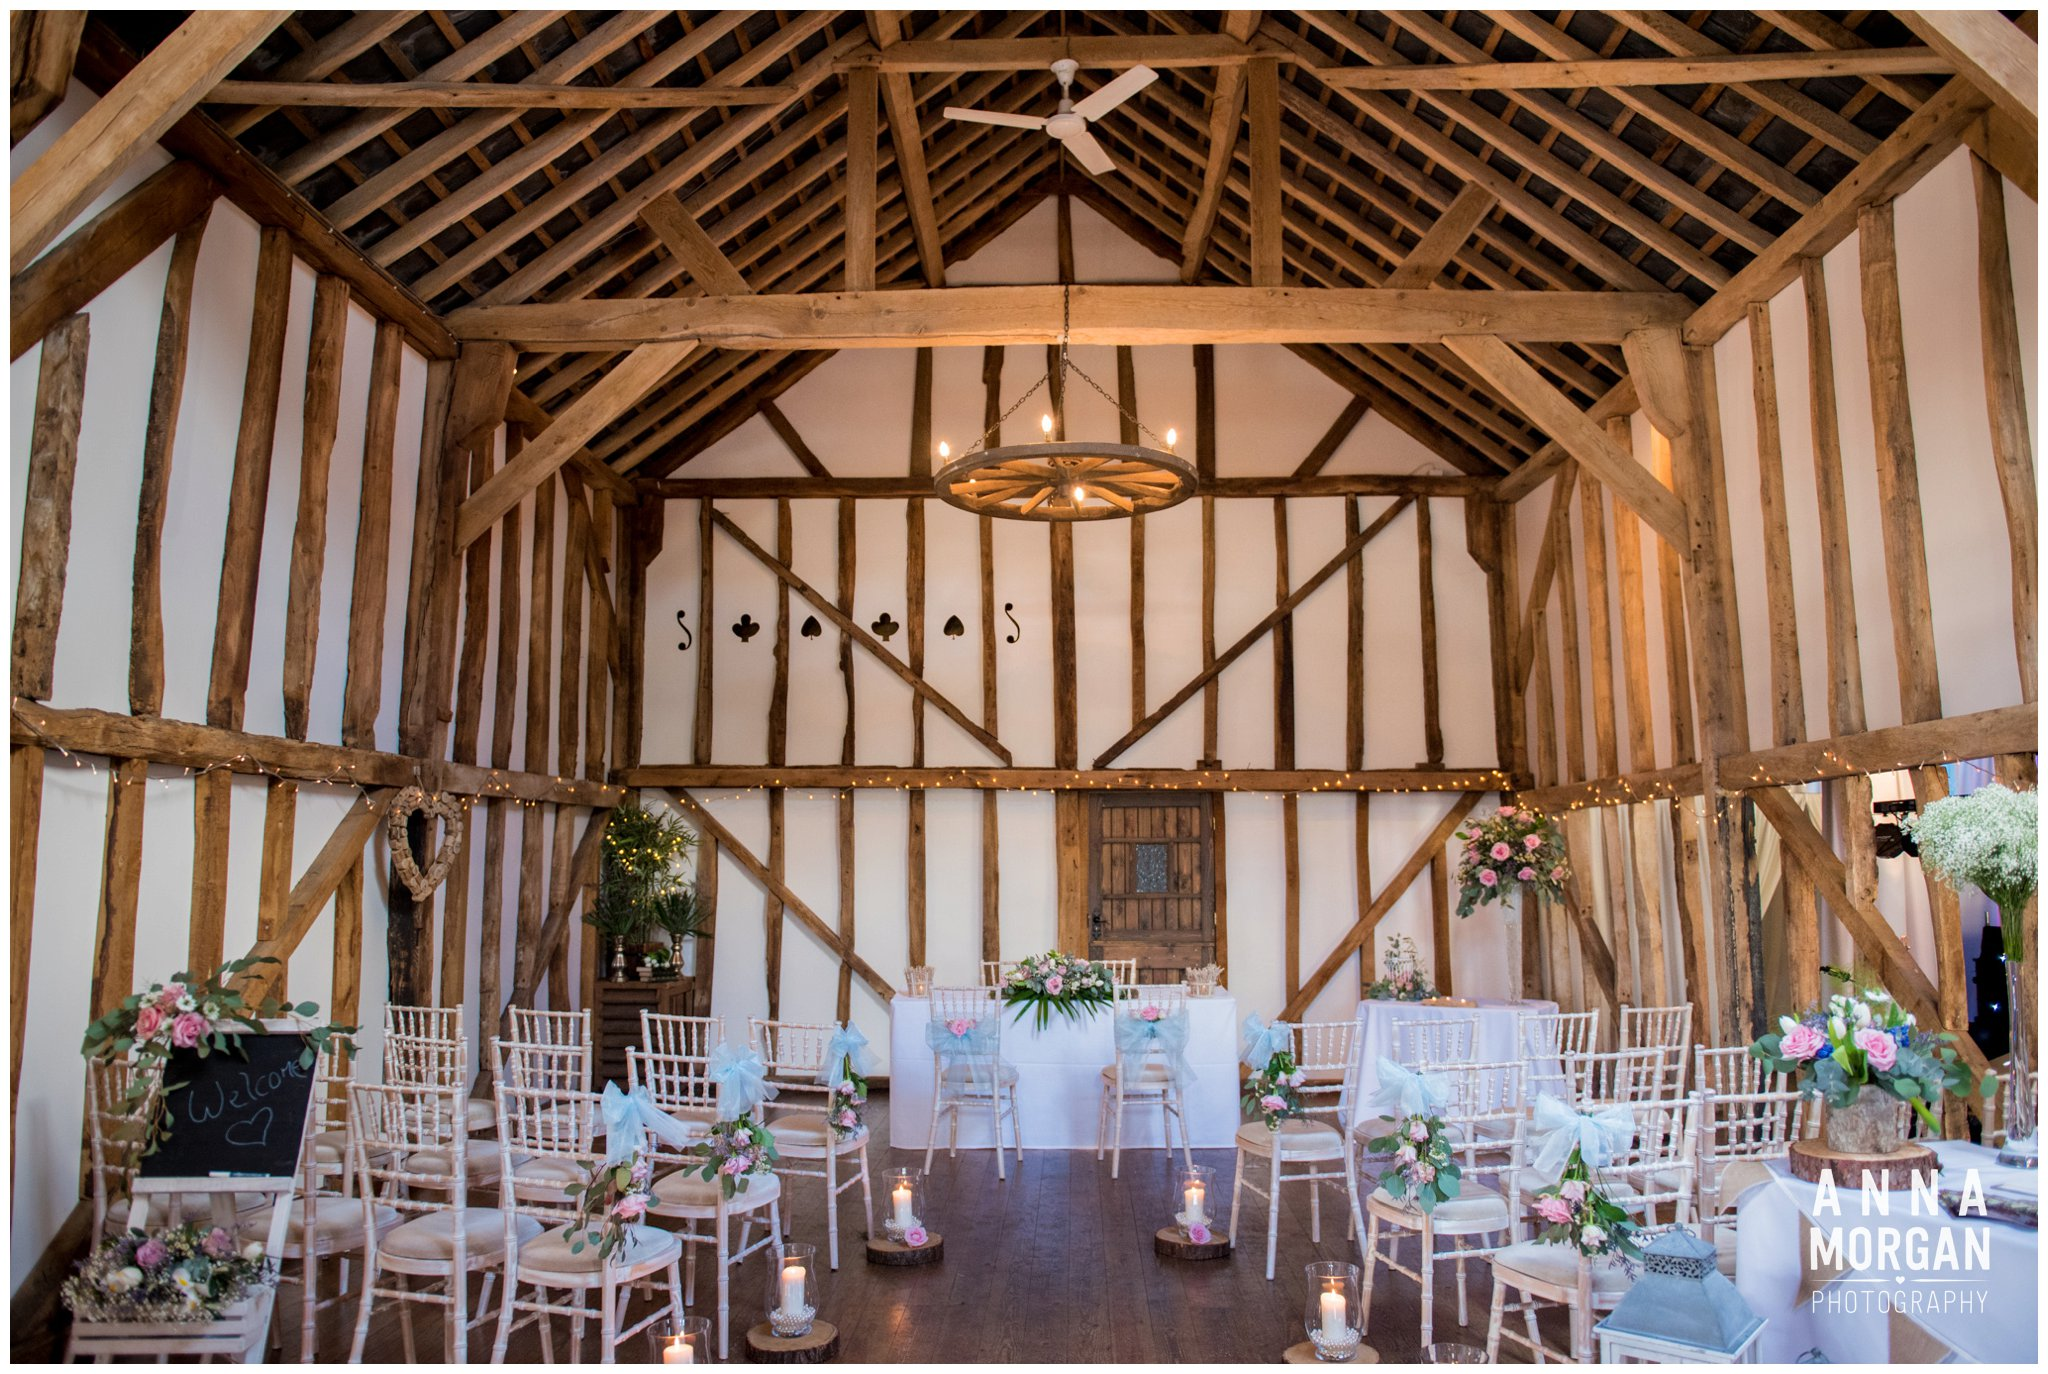 Pitt Hall Barn 2016 Spring Open Day - Hampshire Wedding Venue ...